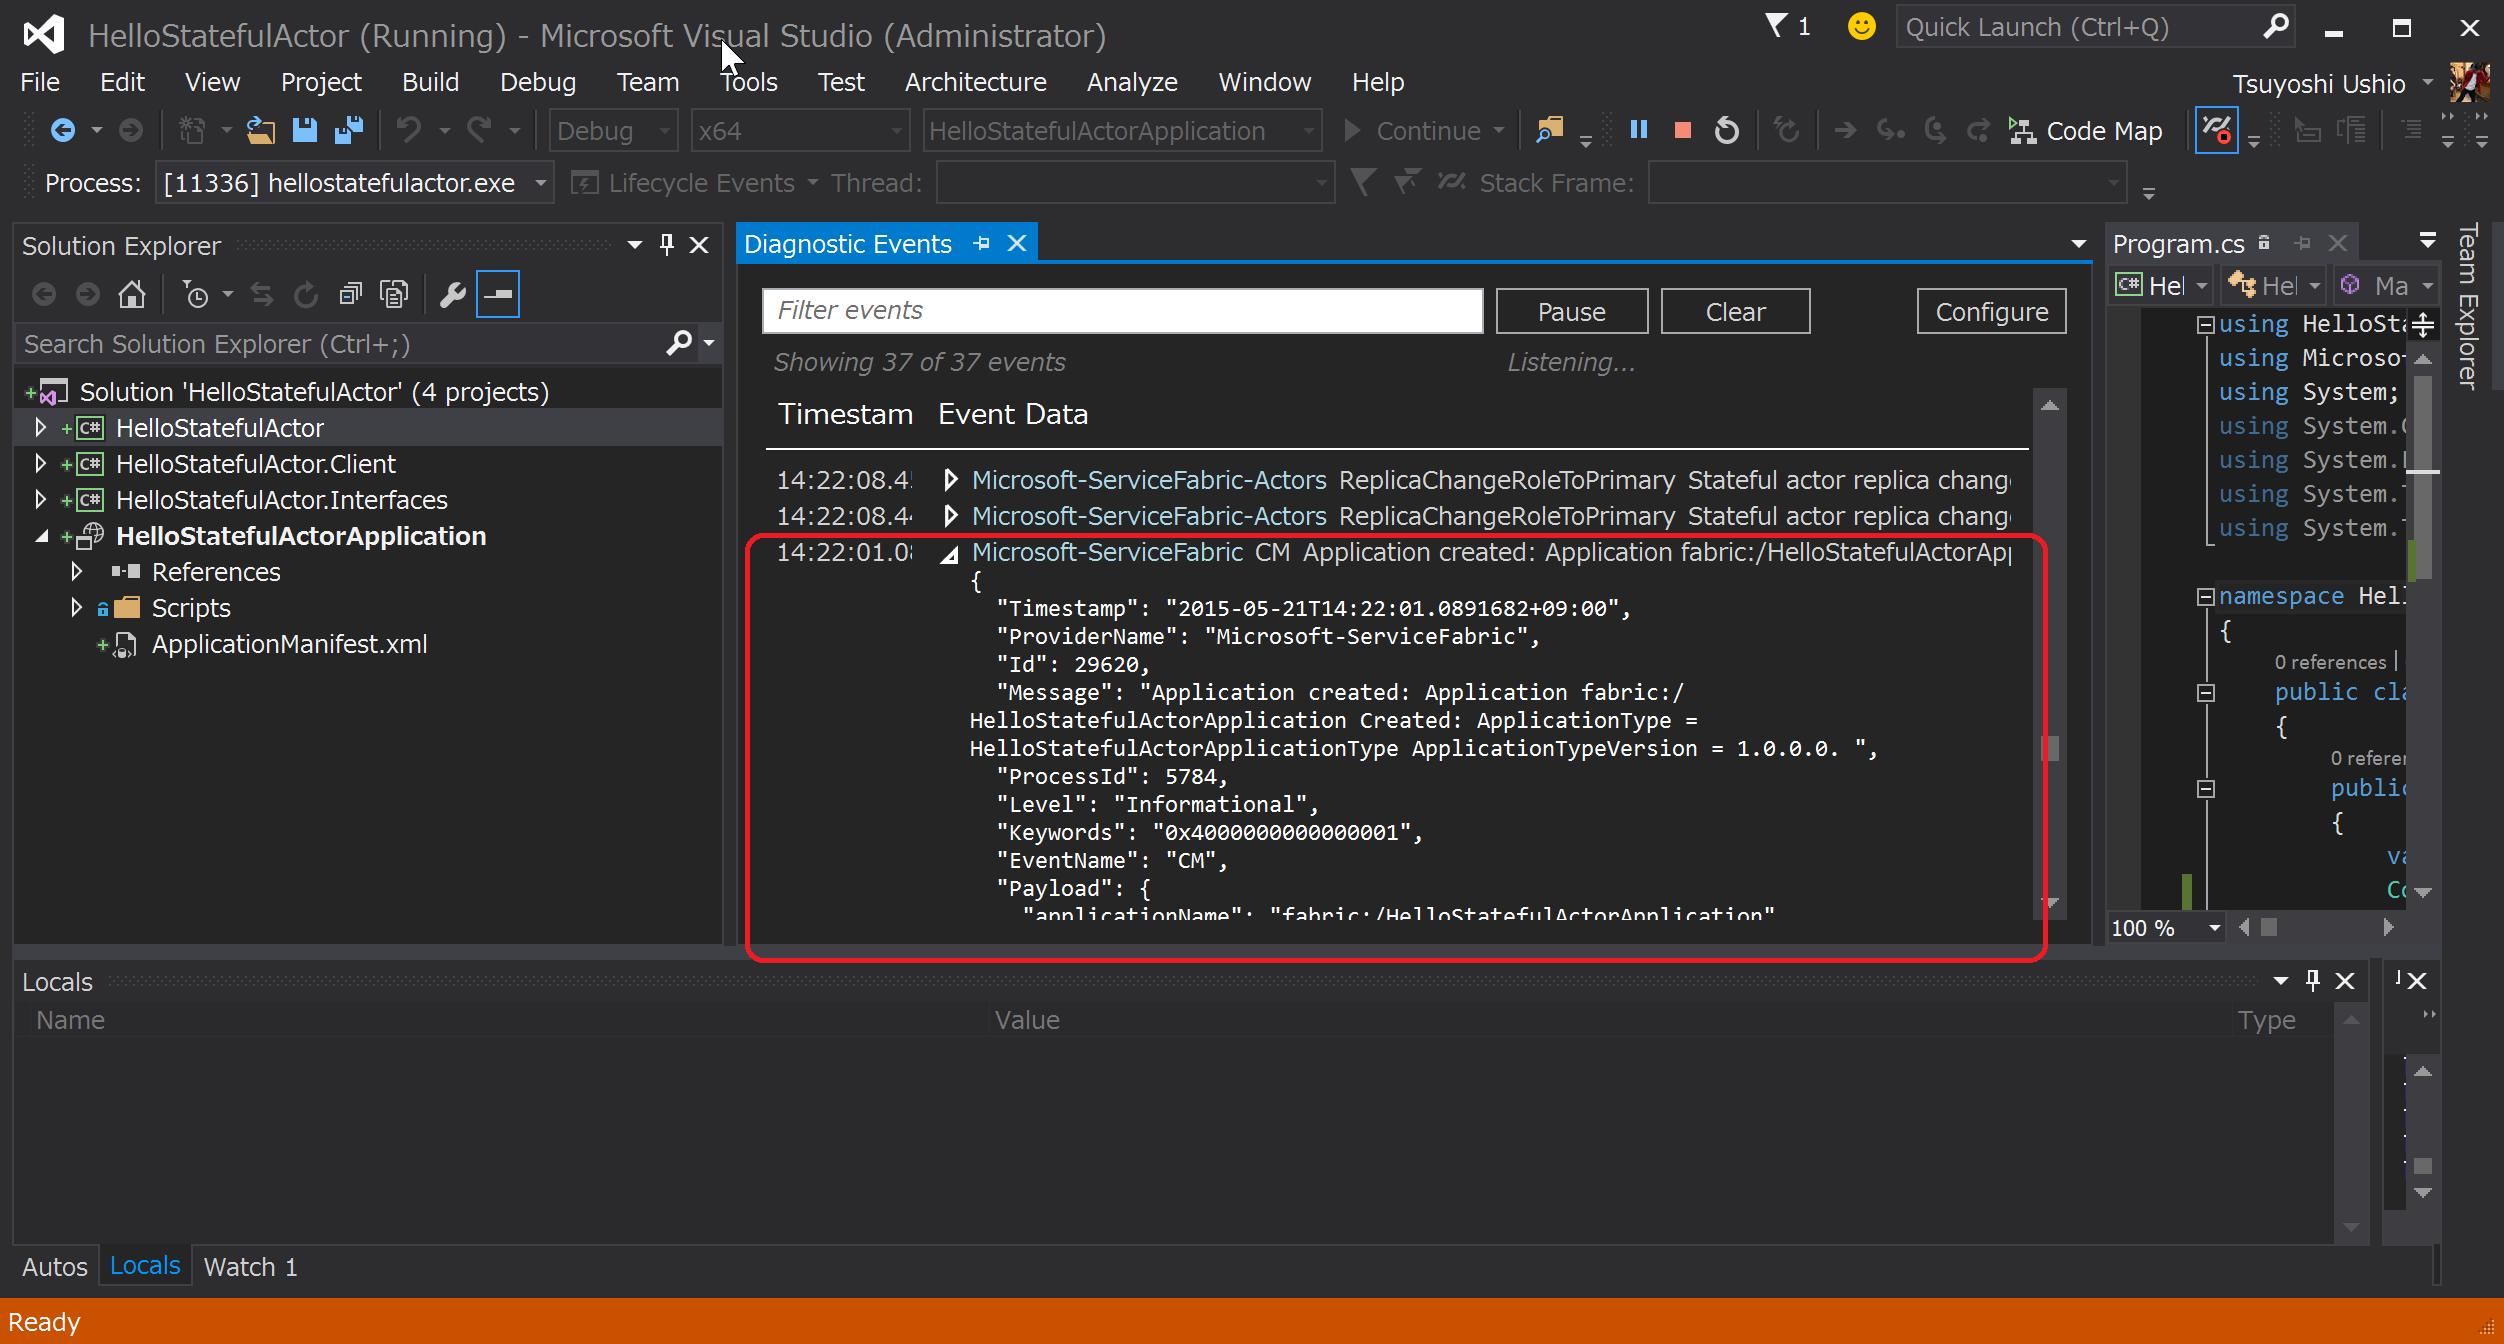 SnapCrab_HelloStatefulActor (Running) - Microsoft Visual Studio (Administrator)_2015-5-21_14-22-37_No-00.png